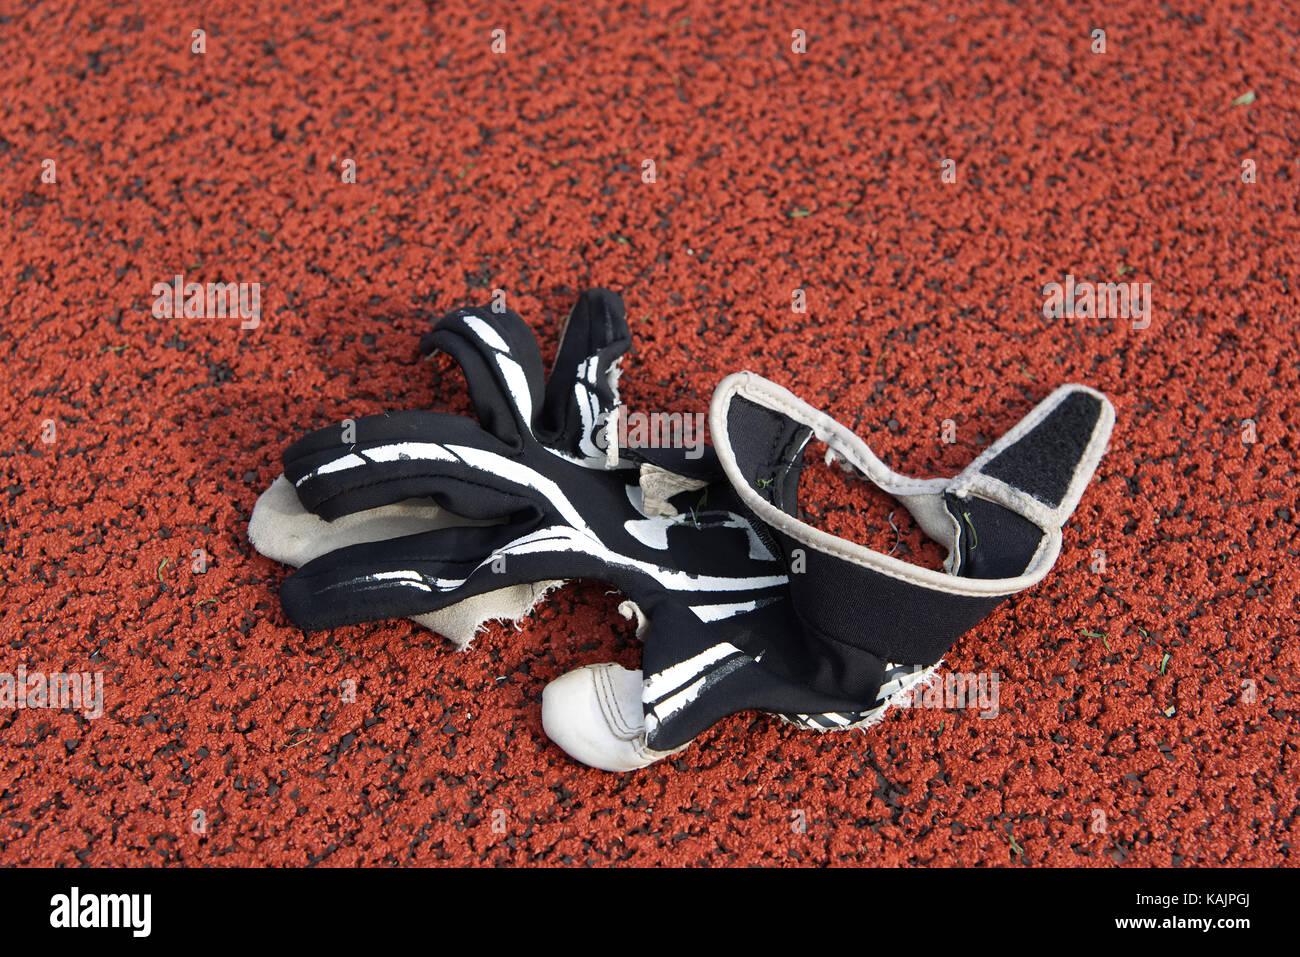 Philadelphia, PA, USA - November 30, 2013; Torn glove lays on a sports field surface. - Stock Image